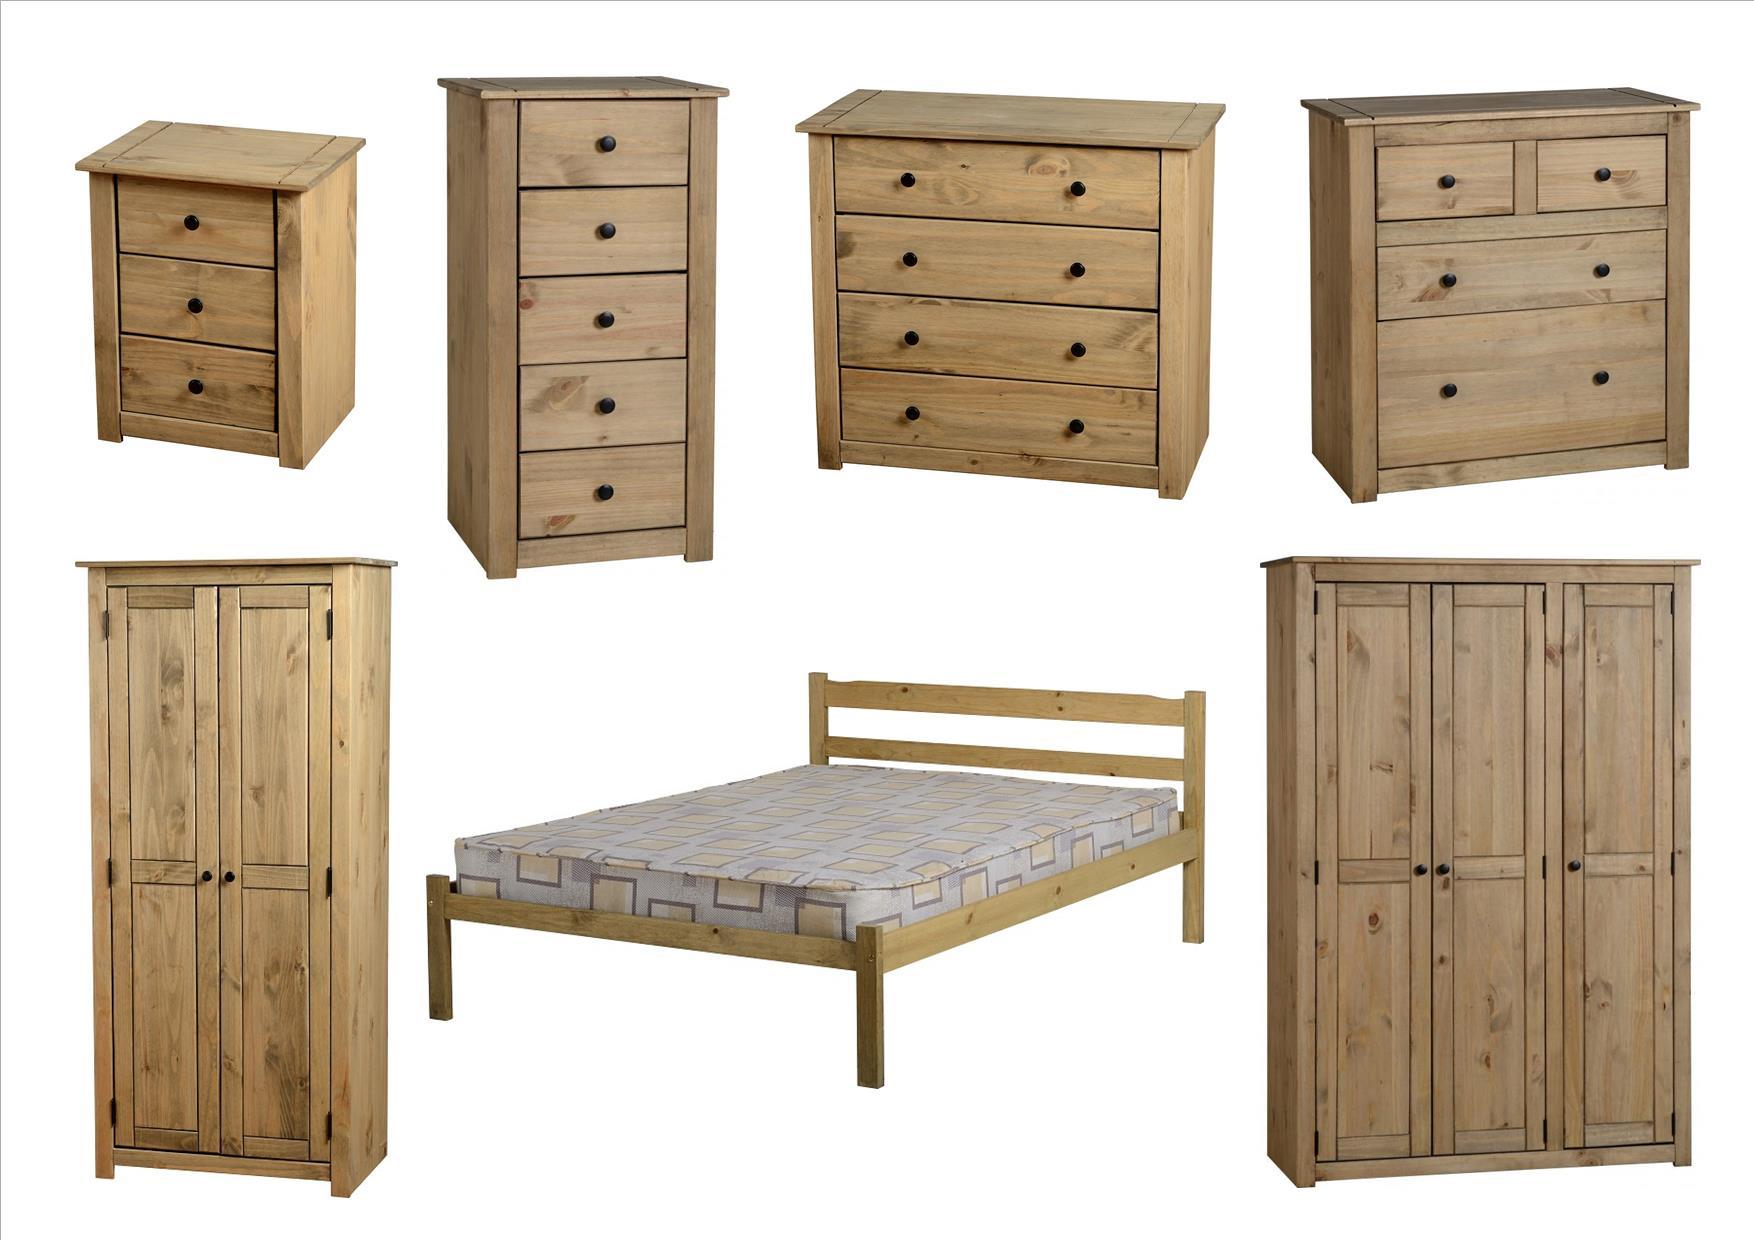 panama bedroom furniture bedside drawers wardrobes beds pine